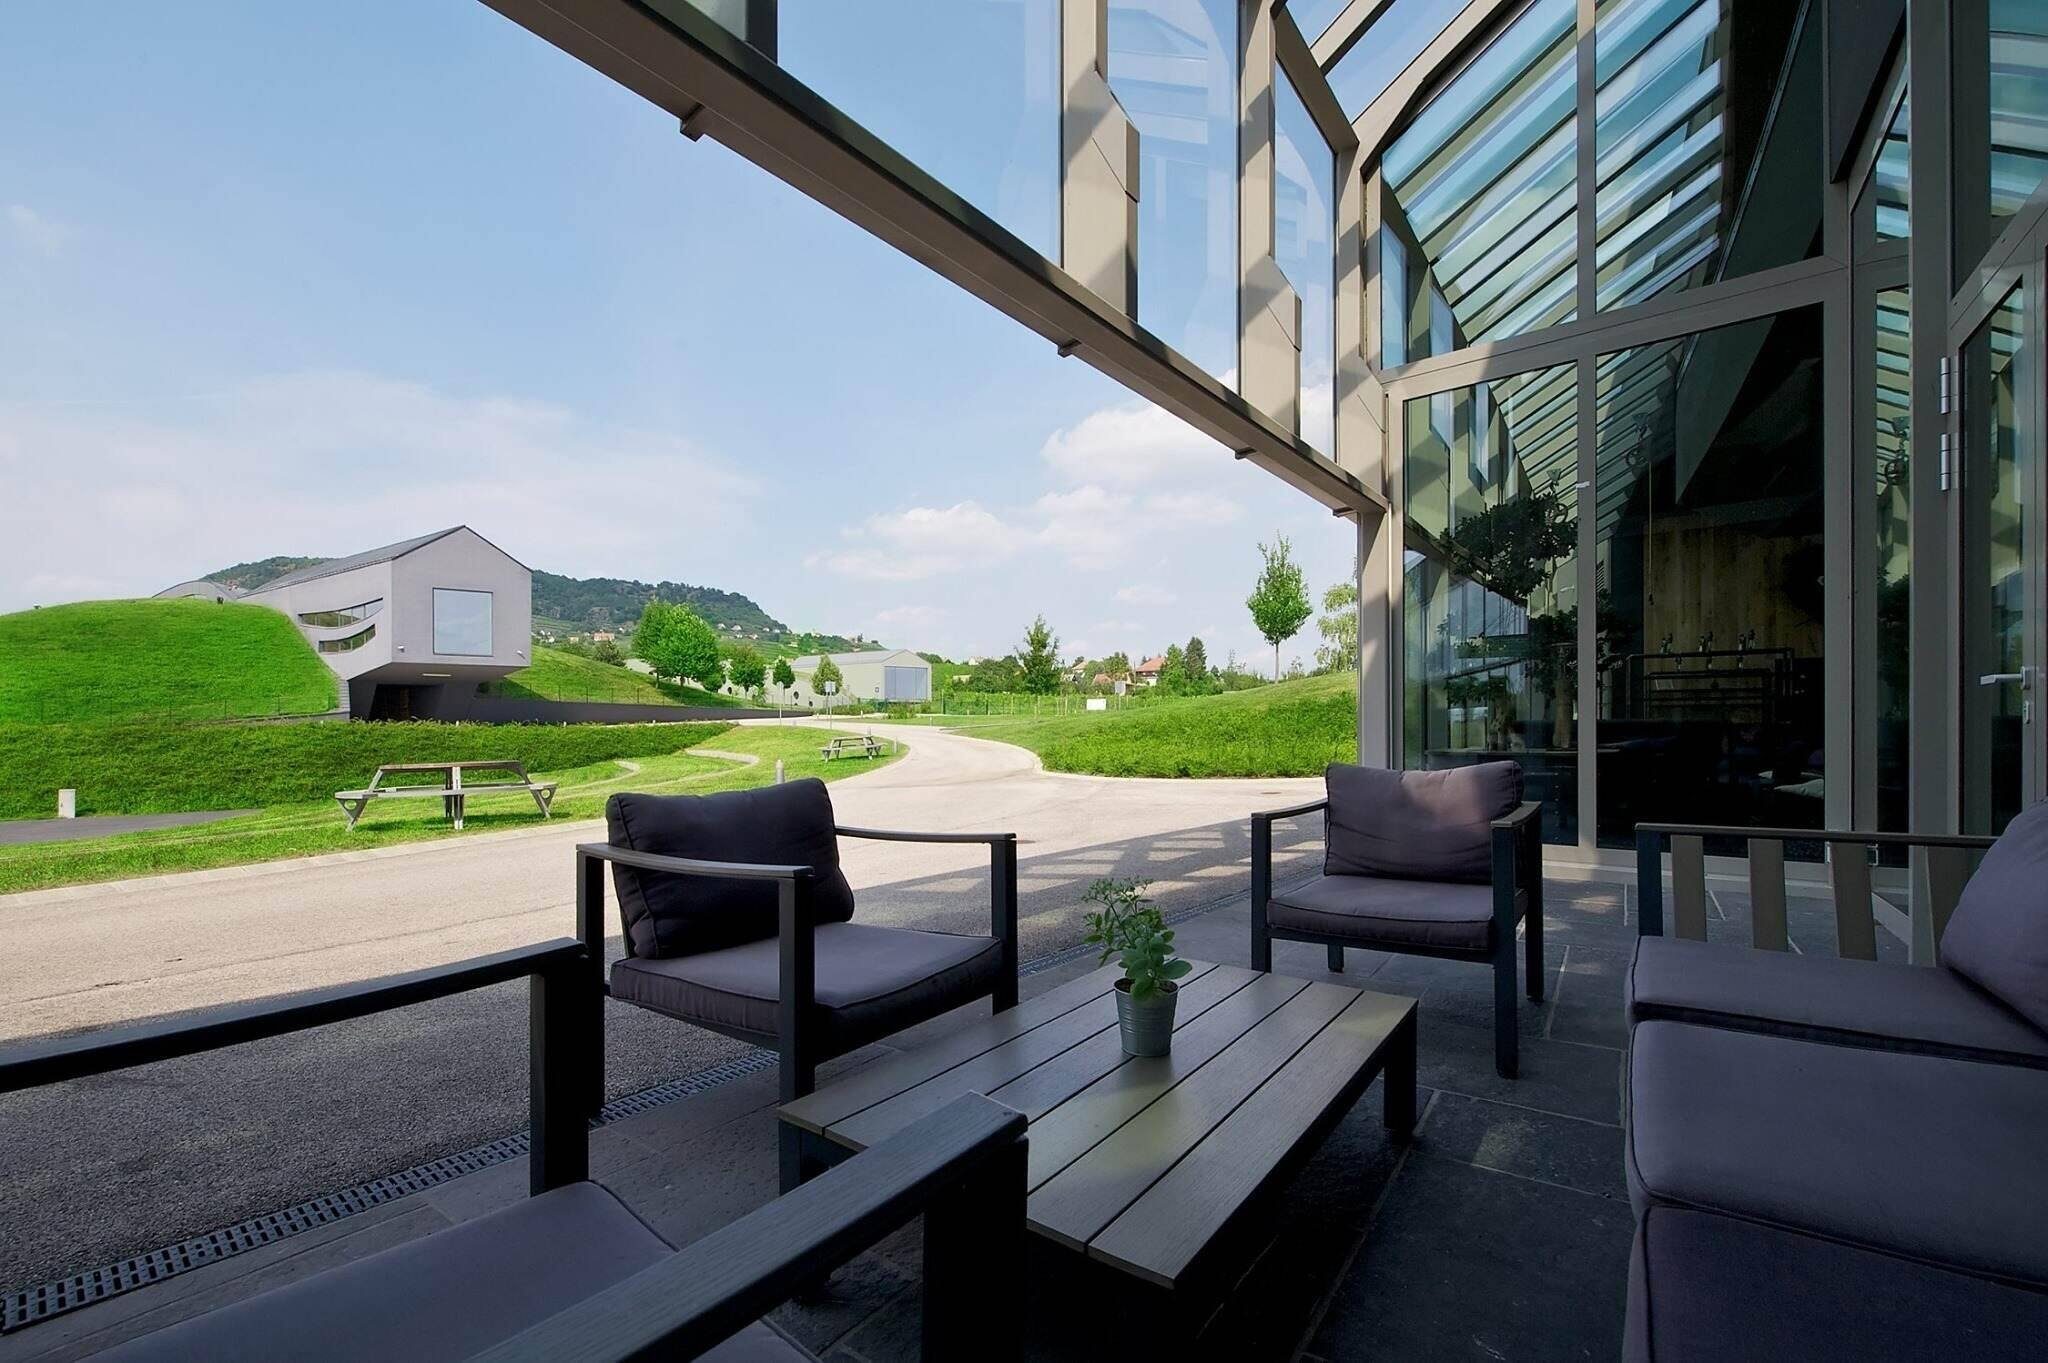 kreinbacher_winery_somló_hungary